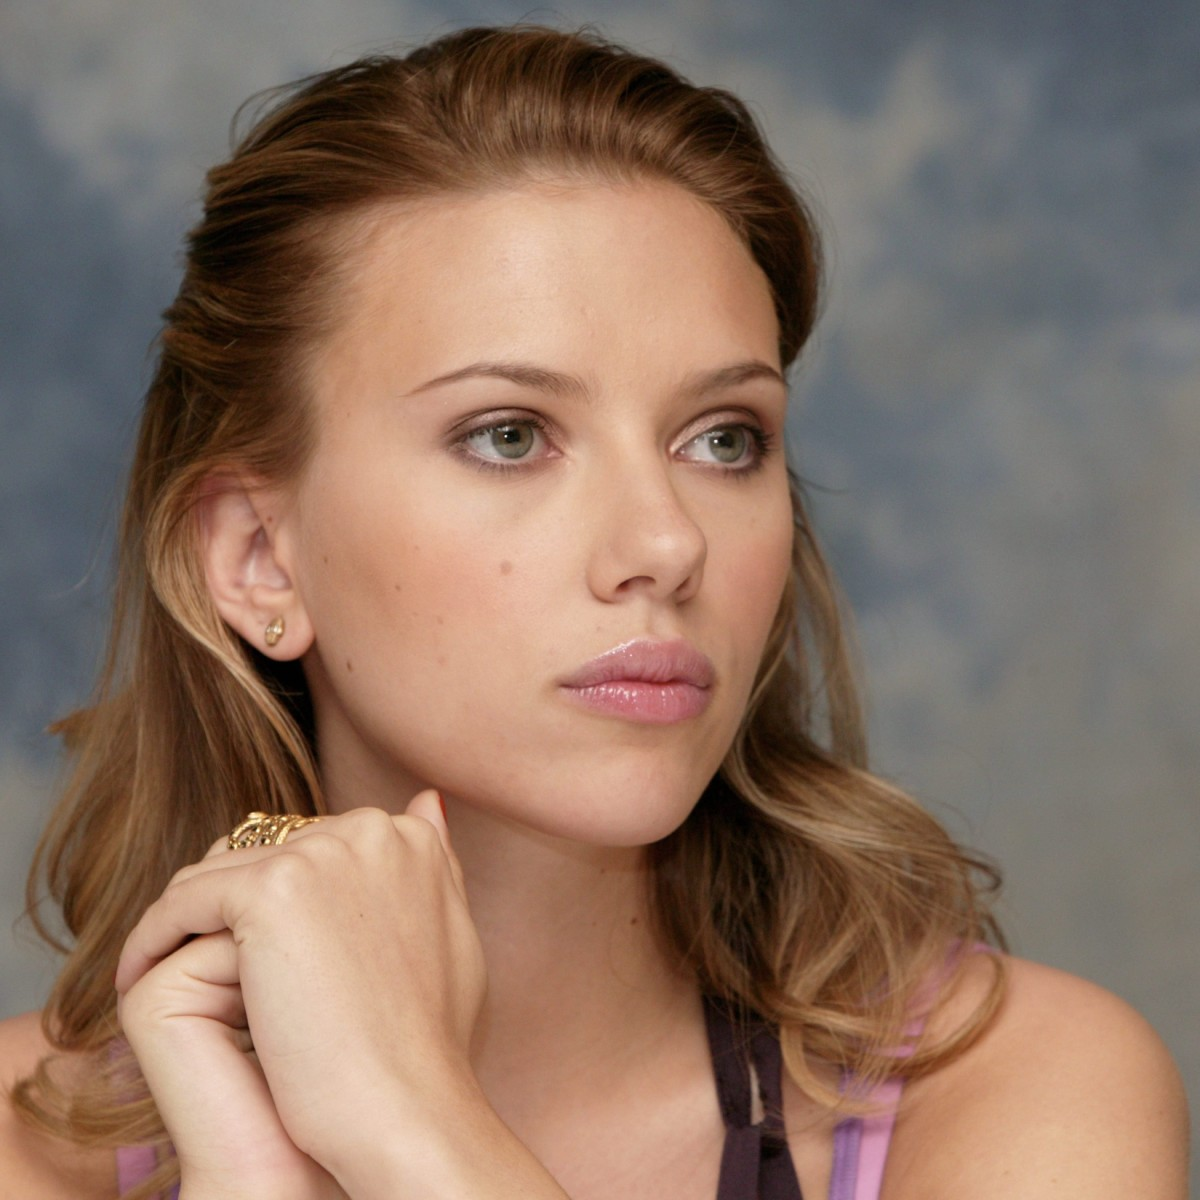 http://2.bp.blogspot.com/-6z7HDPRYk3U/UITZM8yXjdI/AAAAAAAAAvM/gvvwC65Q0aE/s1600/Scarlett+Johansson+Pictures+5.jpg